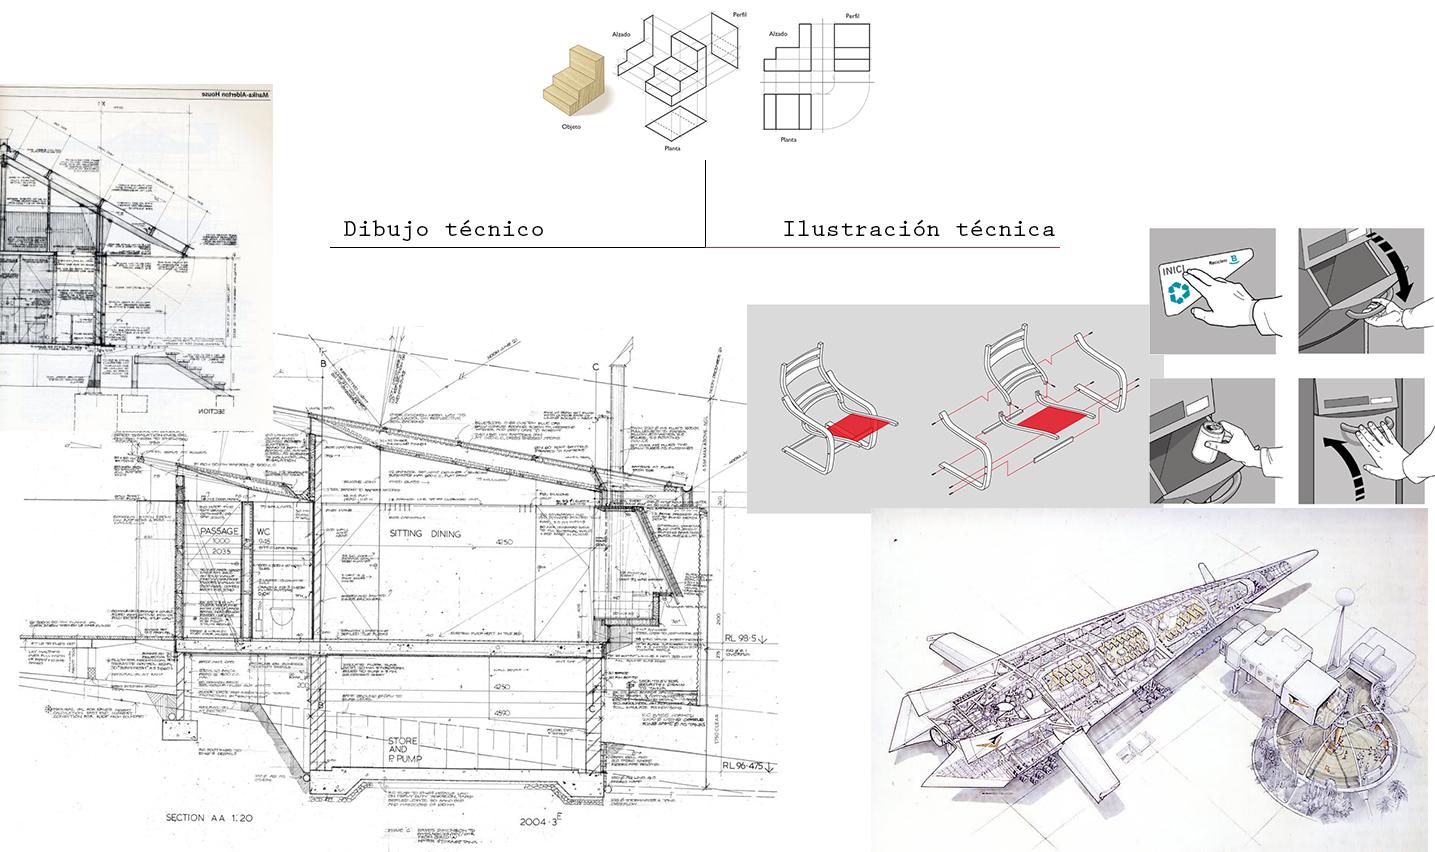 Mimc Artes Ilustracion Tecnica Theory